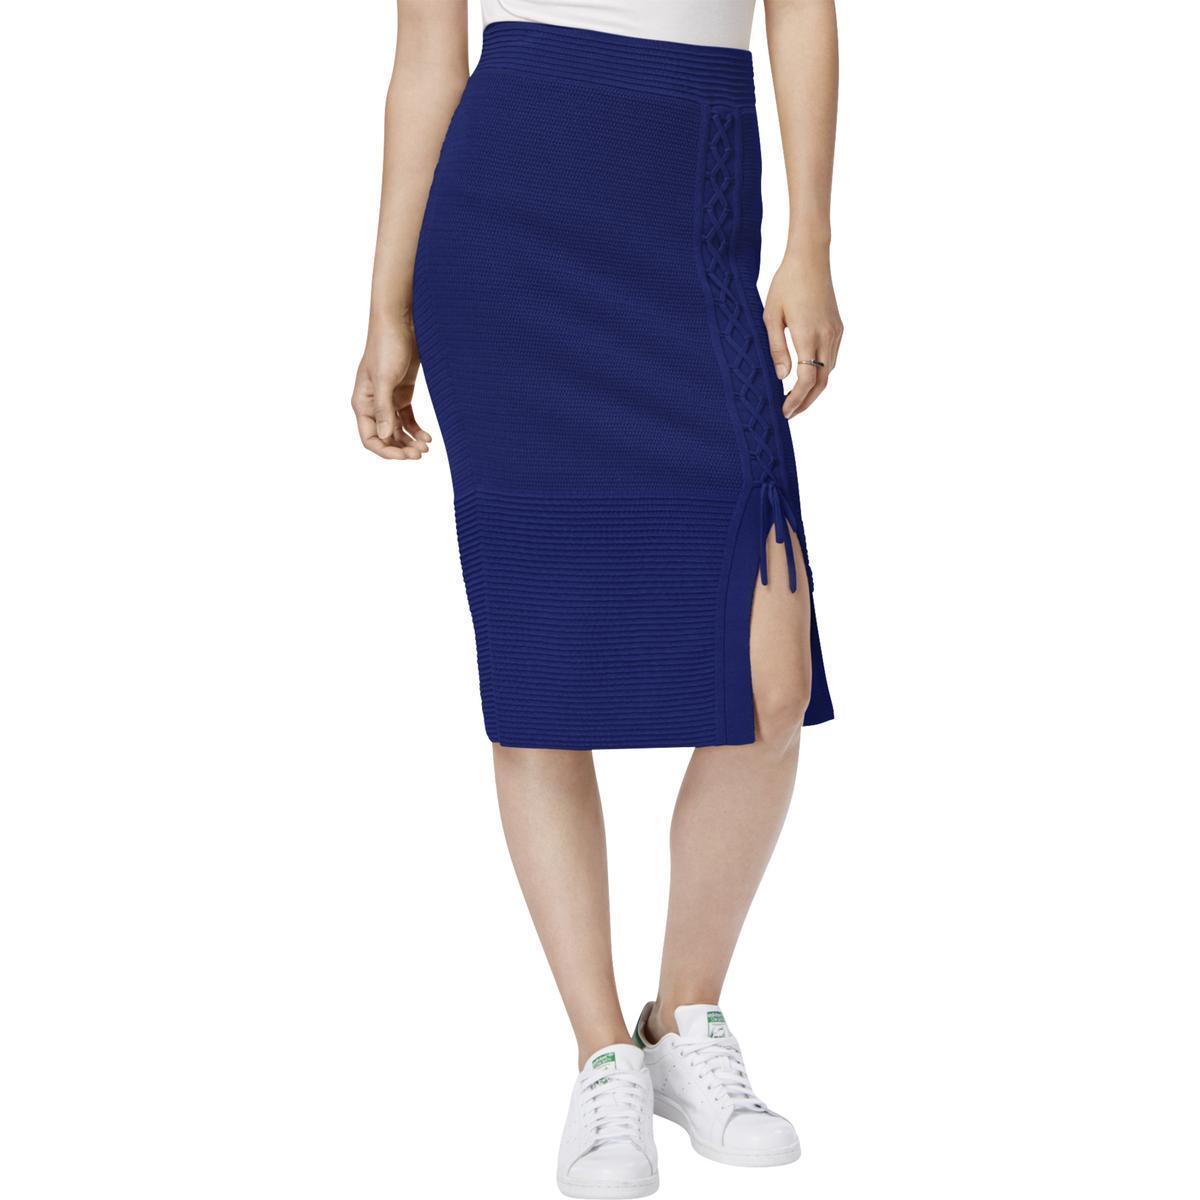 Rachel Roy Womens bluee Iris Lace Up Sweater Knit Pencil Skirt S